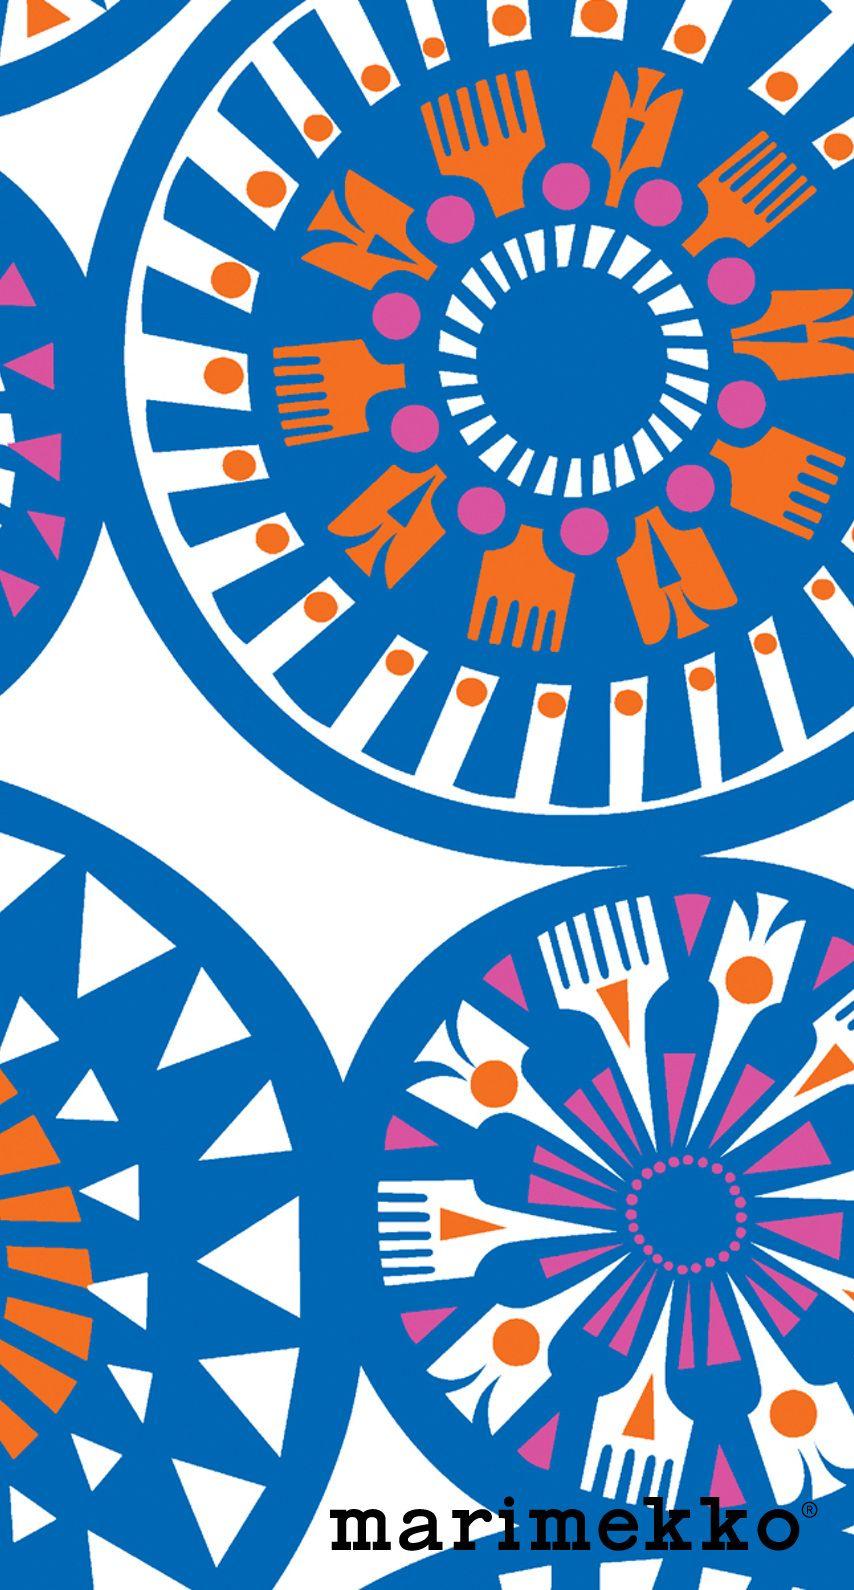 Marimekkofloral15 布地プリント 北欧 壁紙 パターンデザイン